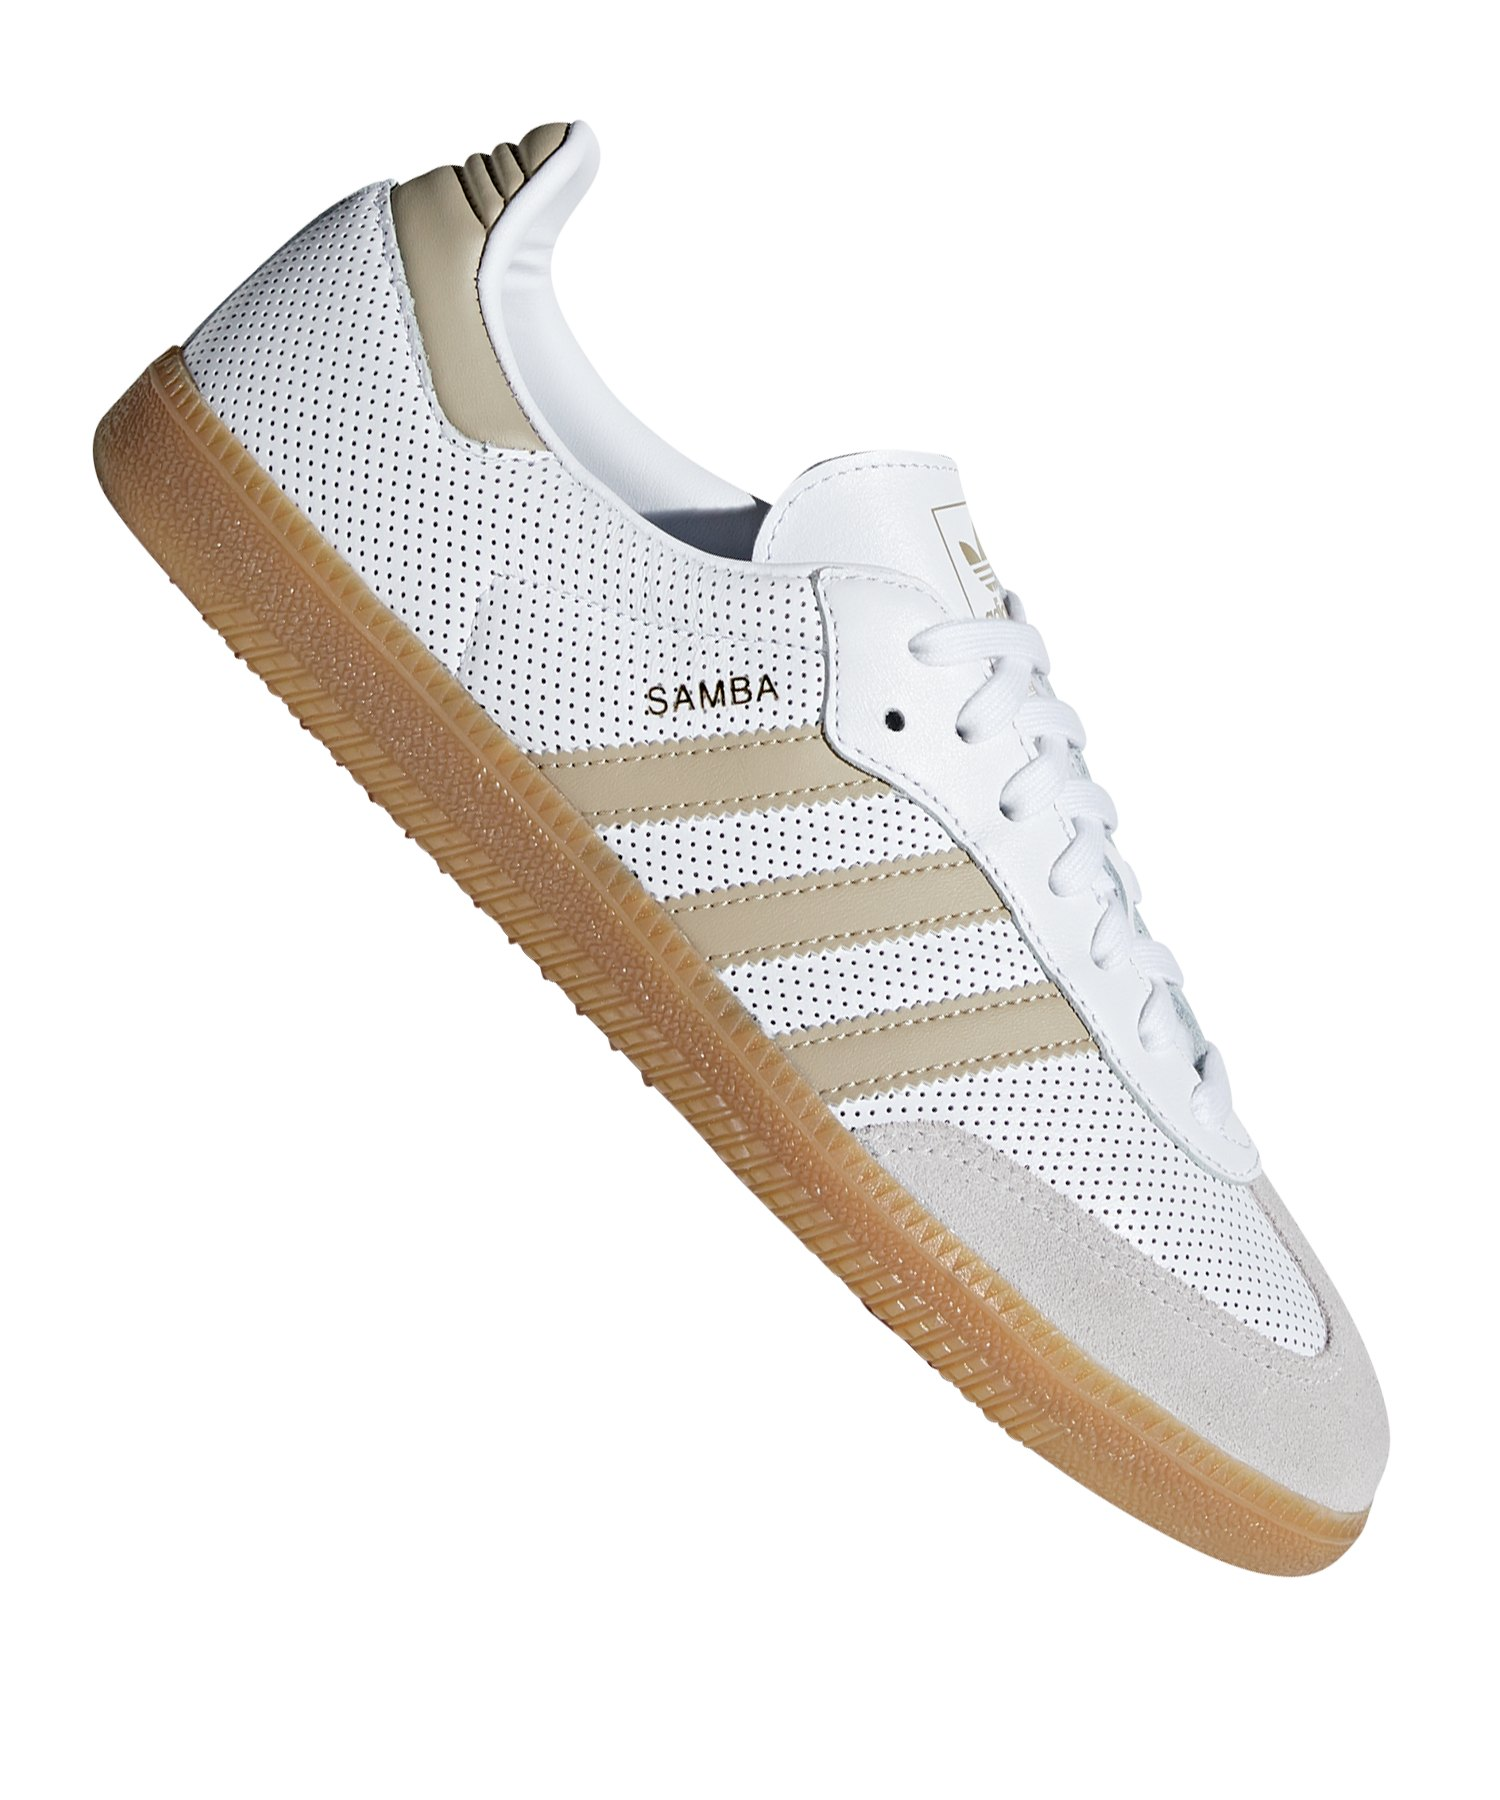 adidas UltraBOOST Schuhe beige Herren Schuhe Lifestyle